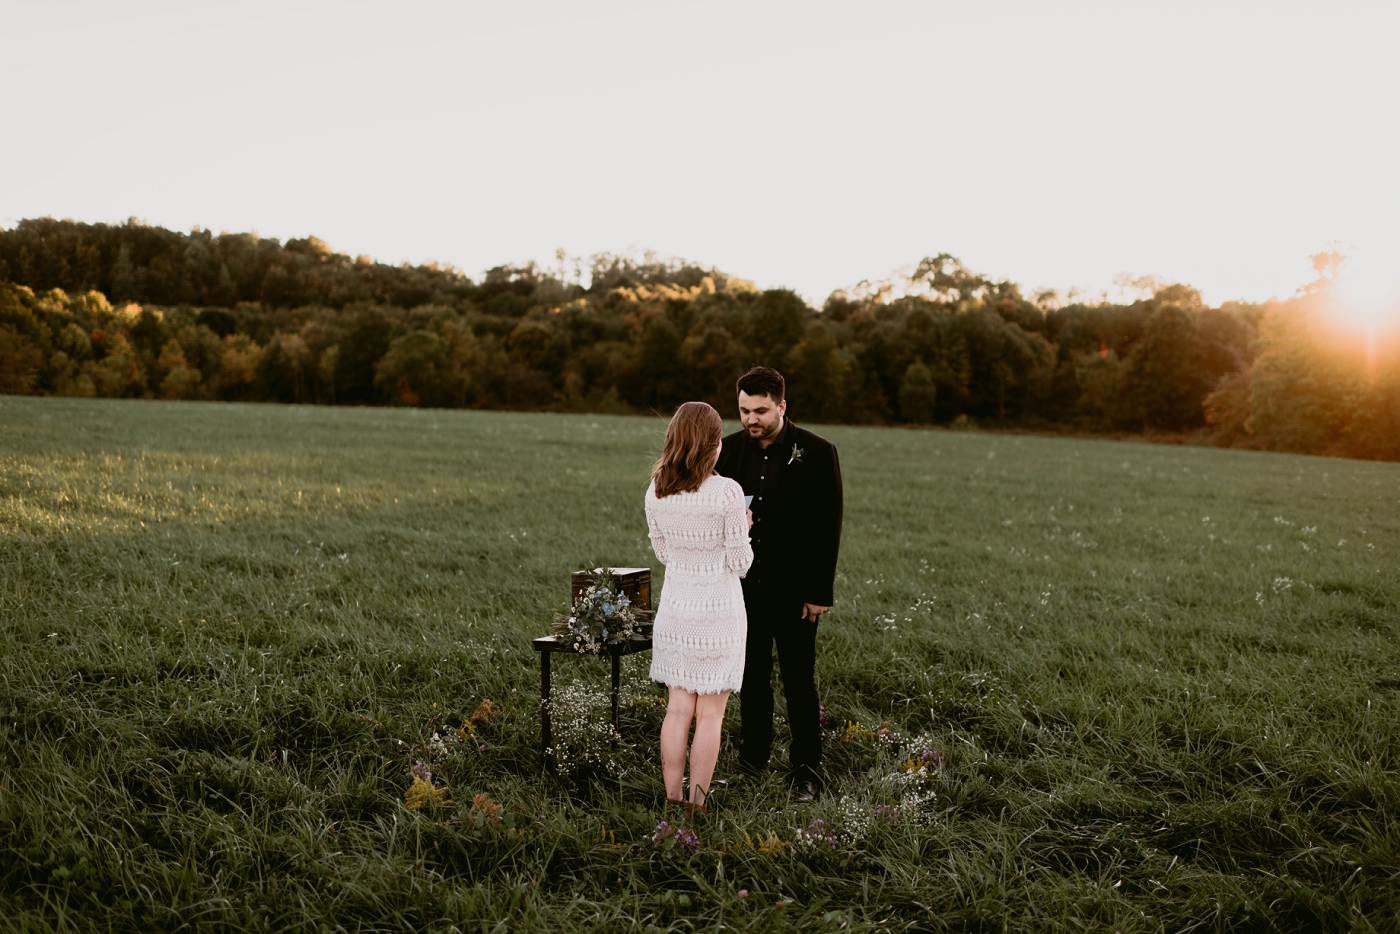 Wildflower-Field-Elopement-Vow-Renewal_Lisa+Chad_MJPHOTO-166.JPG